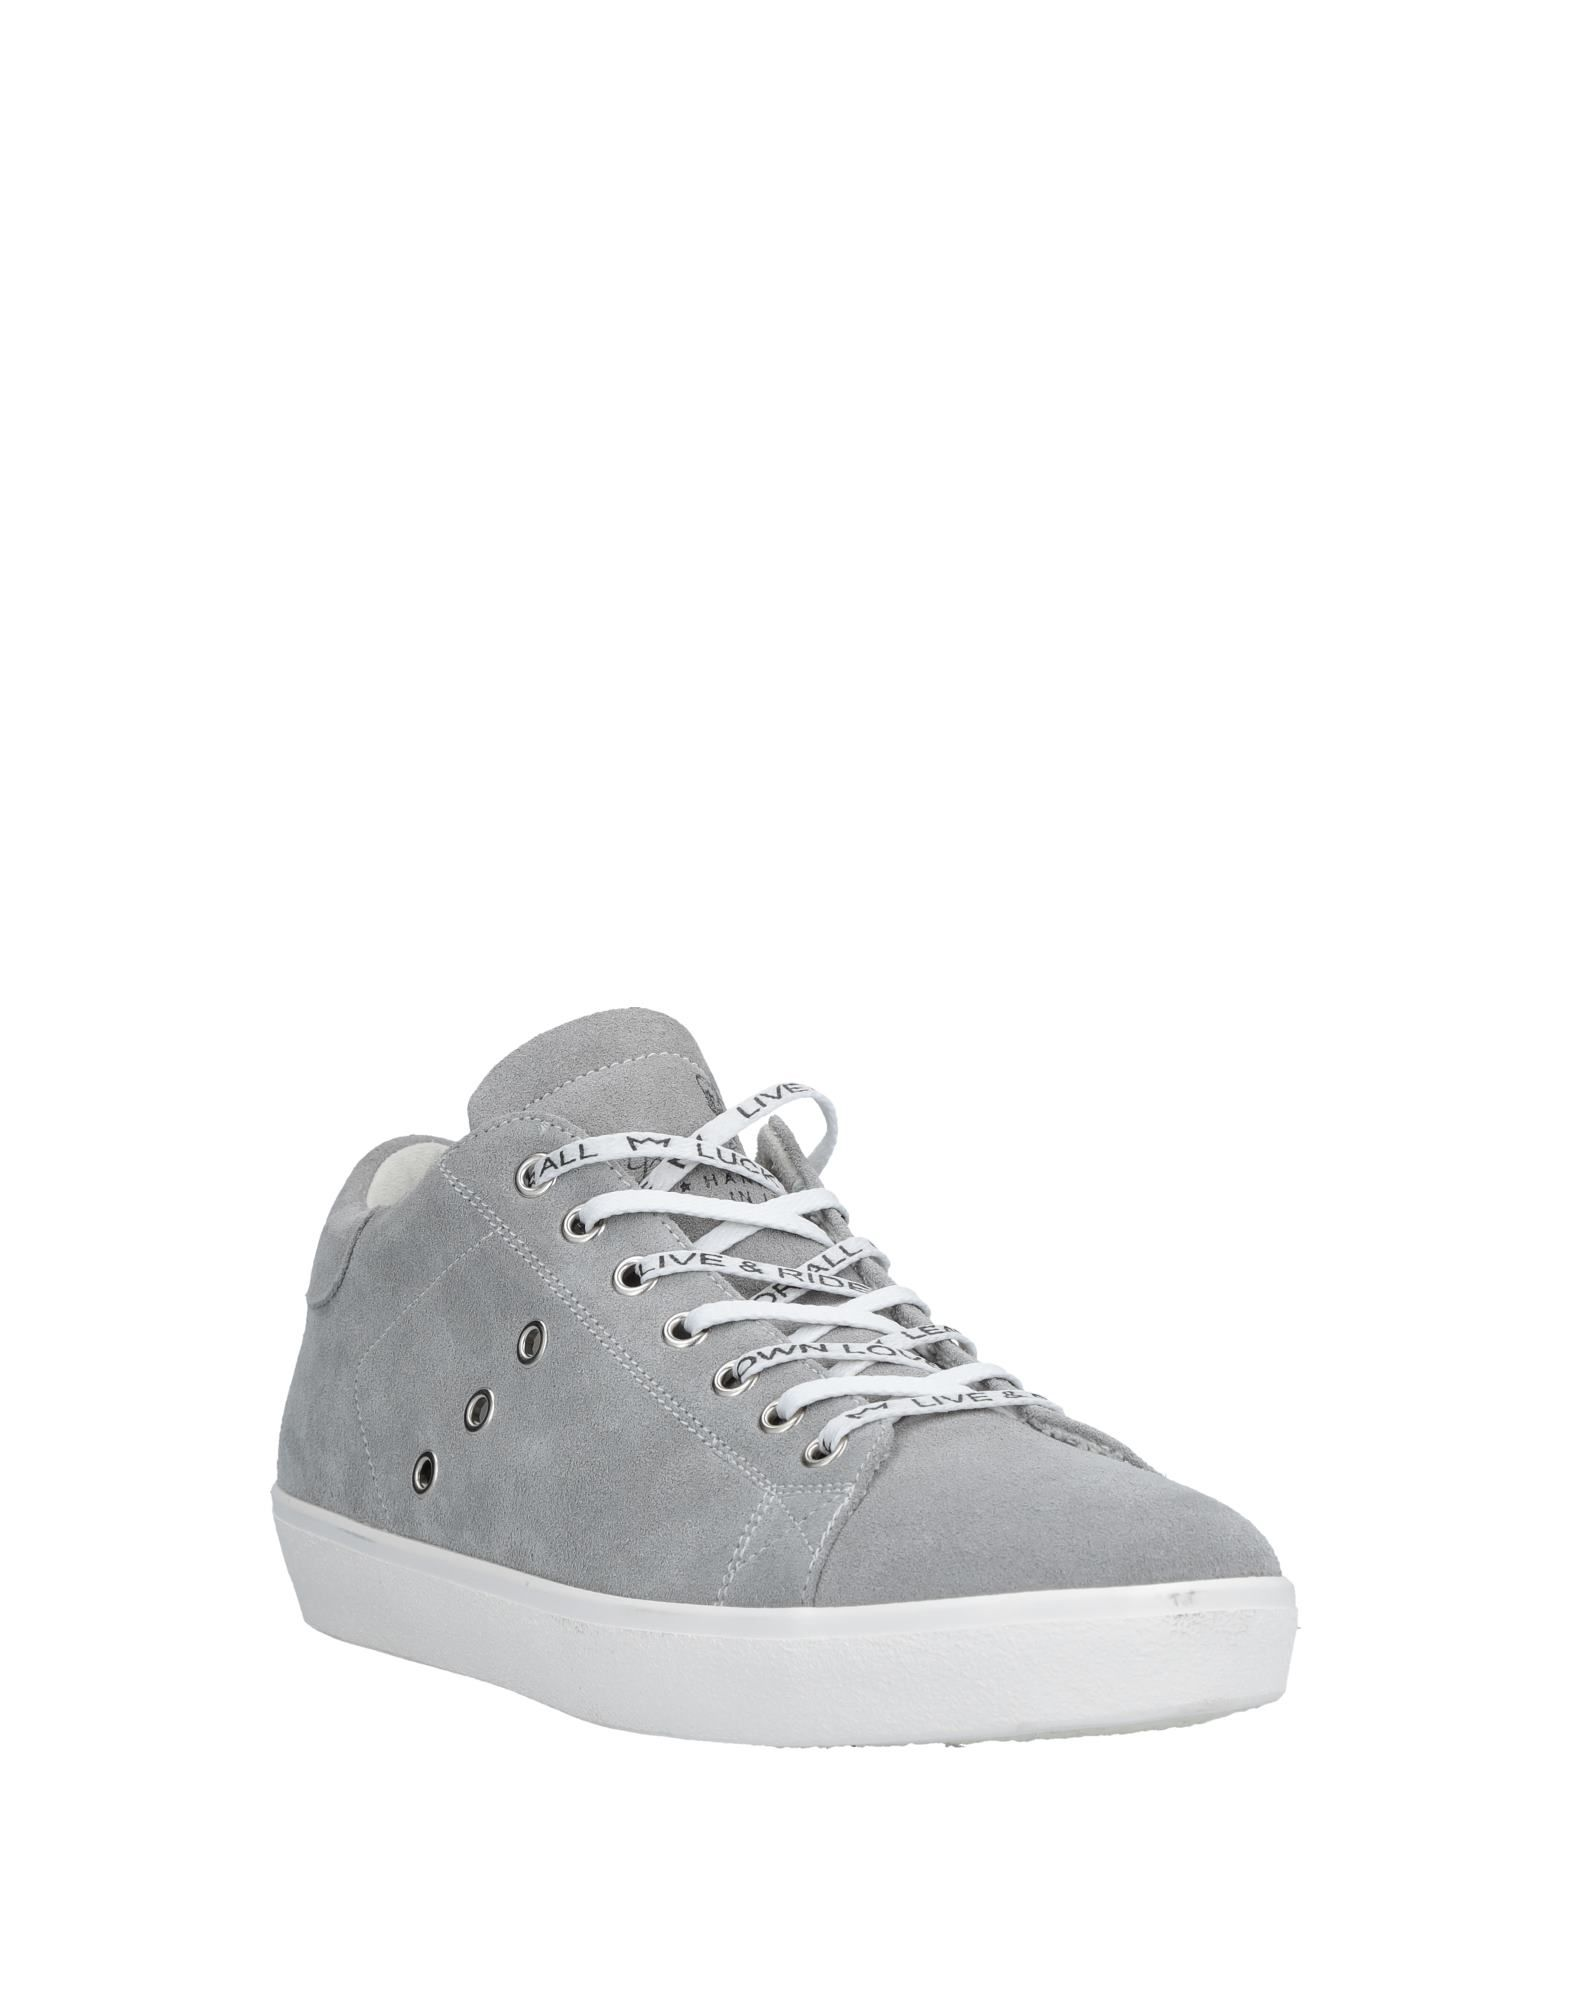 Leather Crown Crown Leather Sneakers Herren  11436581XG Neue Schuhe 52b482